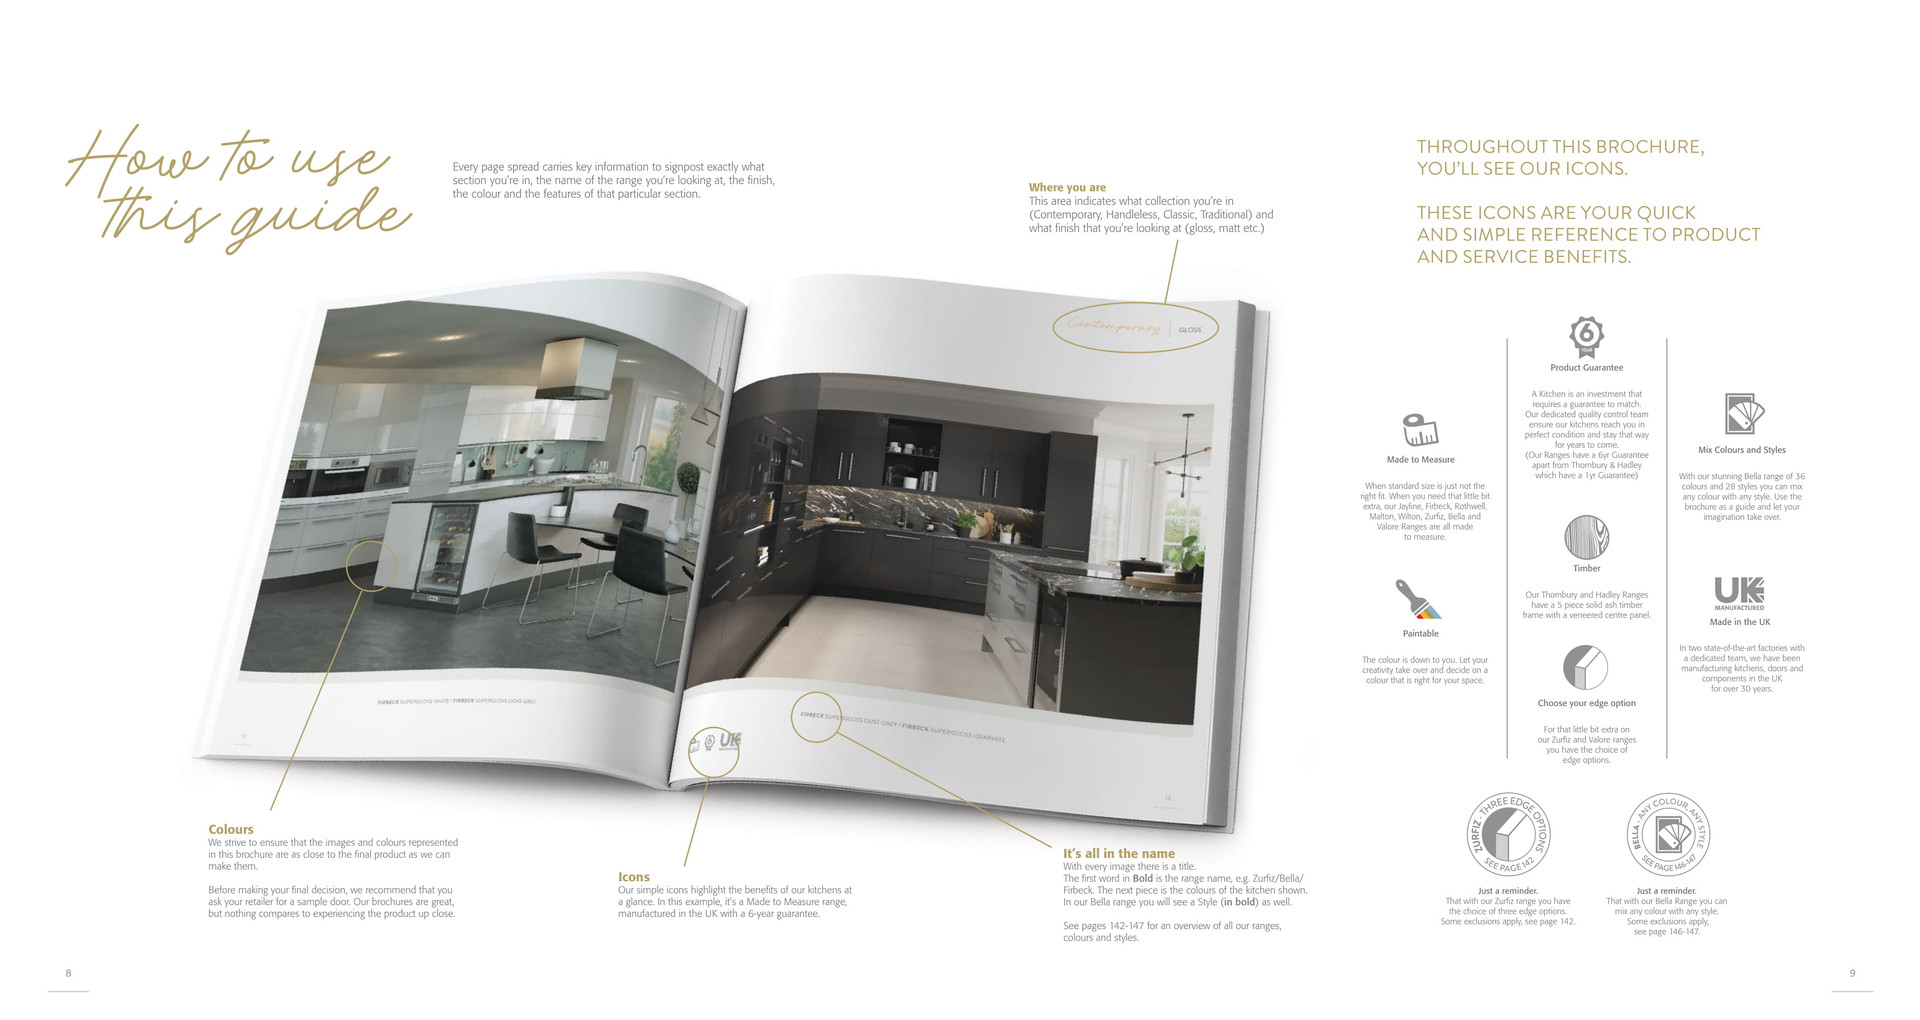 blossom-avenue-kitchen-brochure-2020-05.